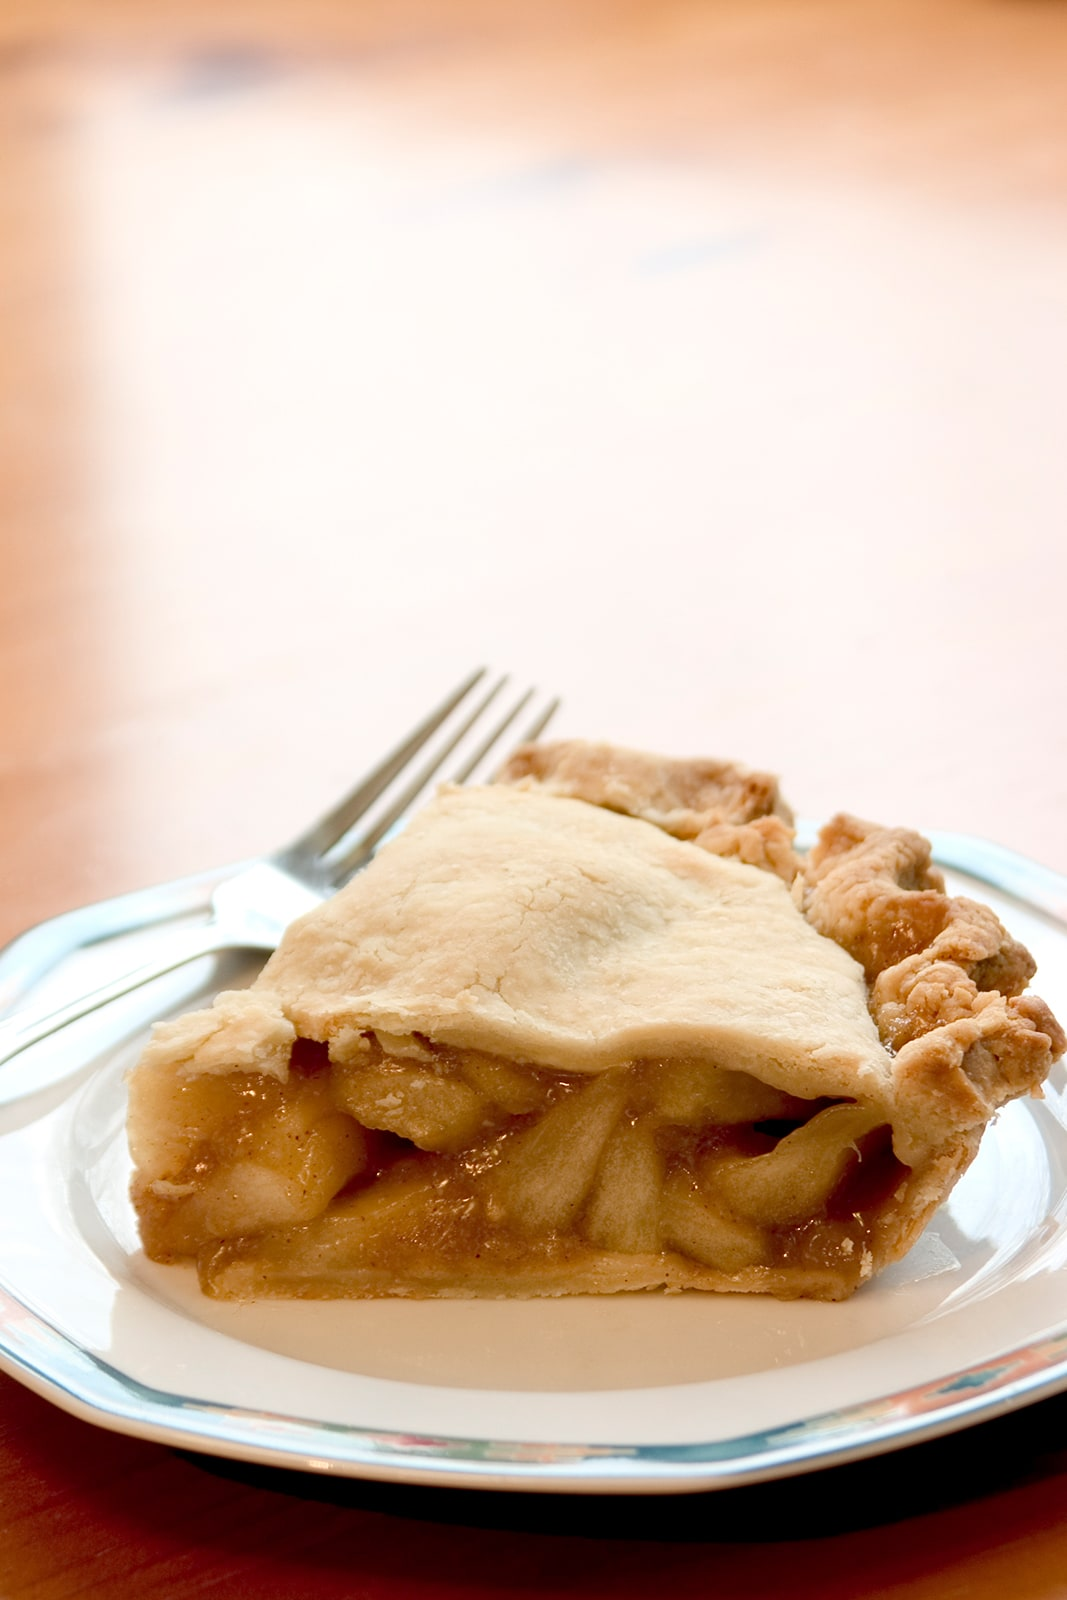 _0010_photography-food-pie